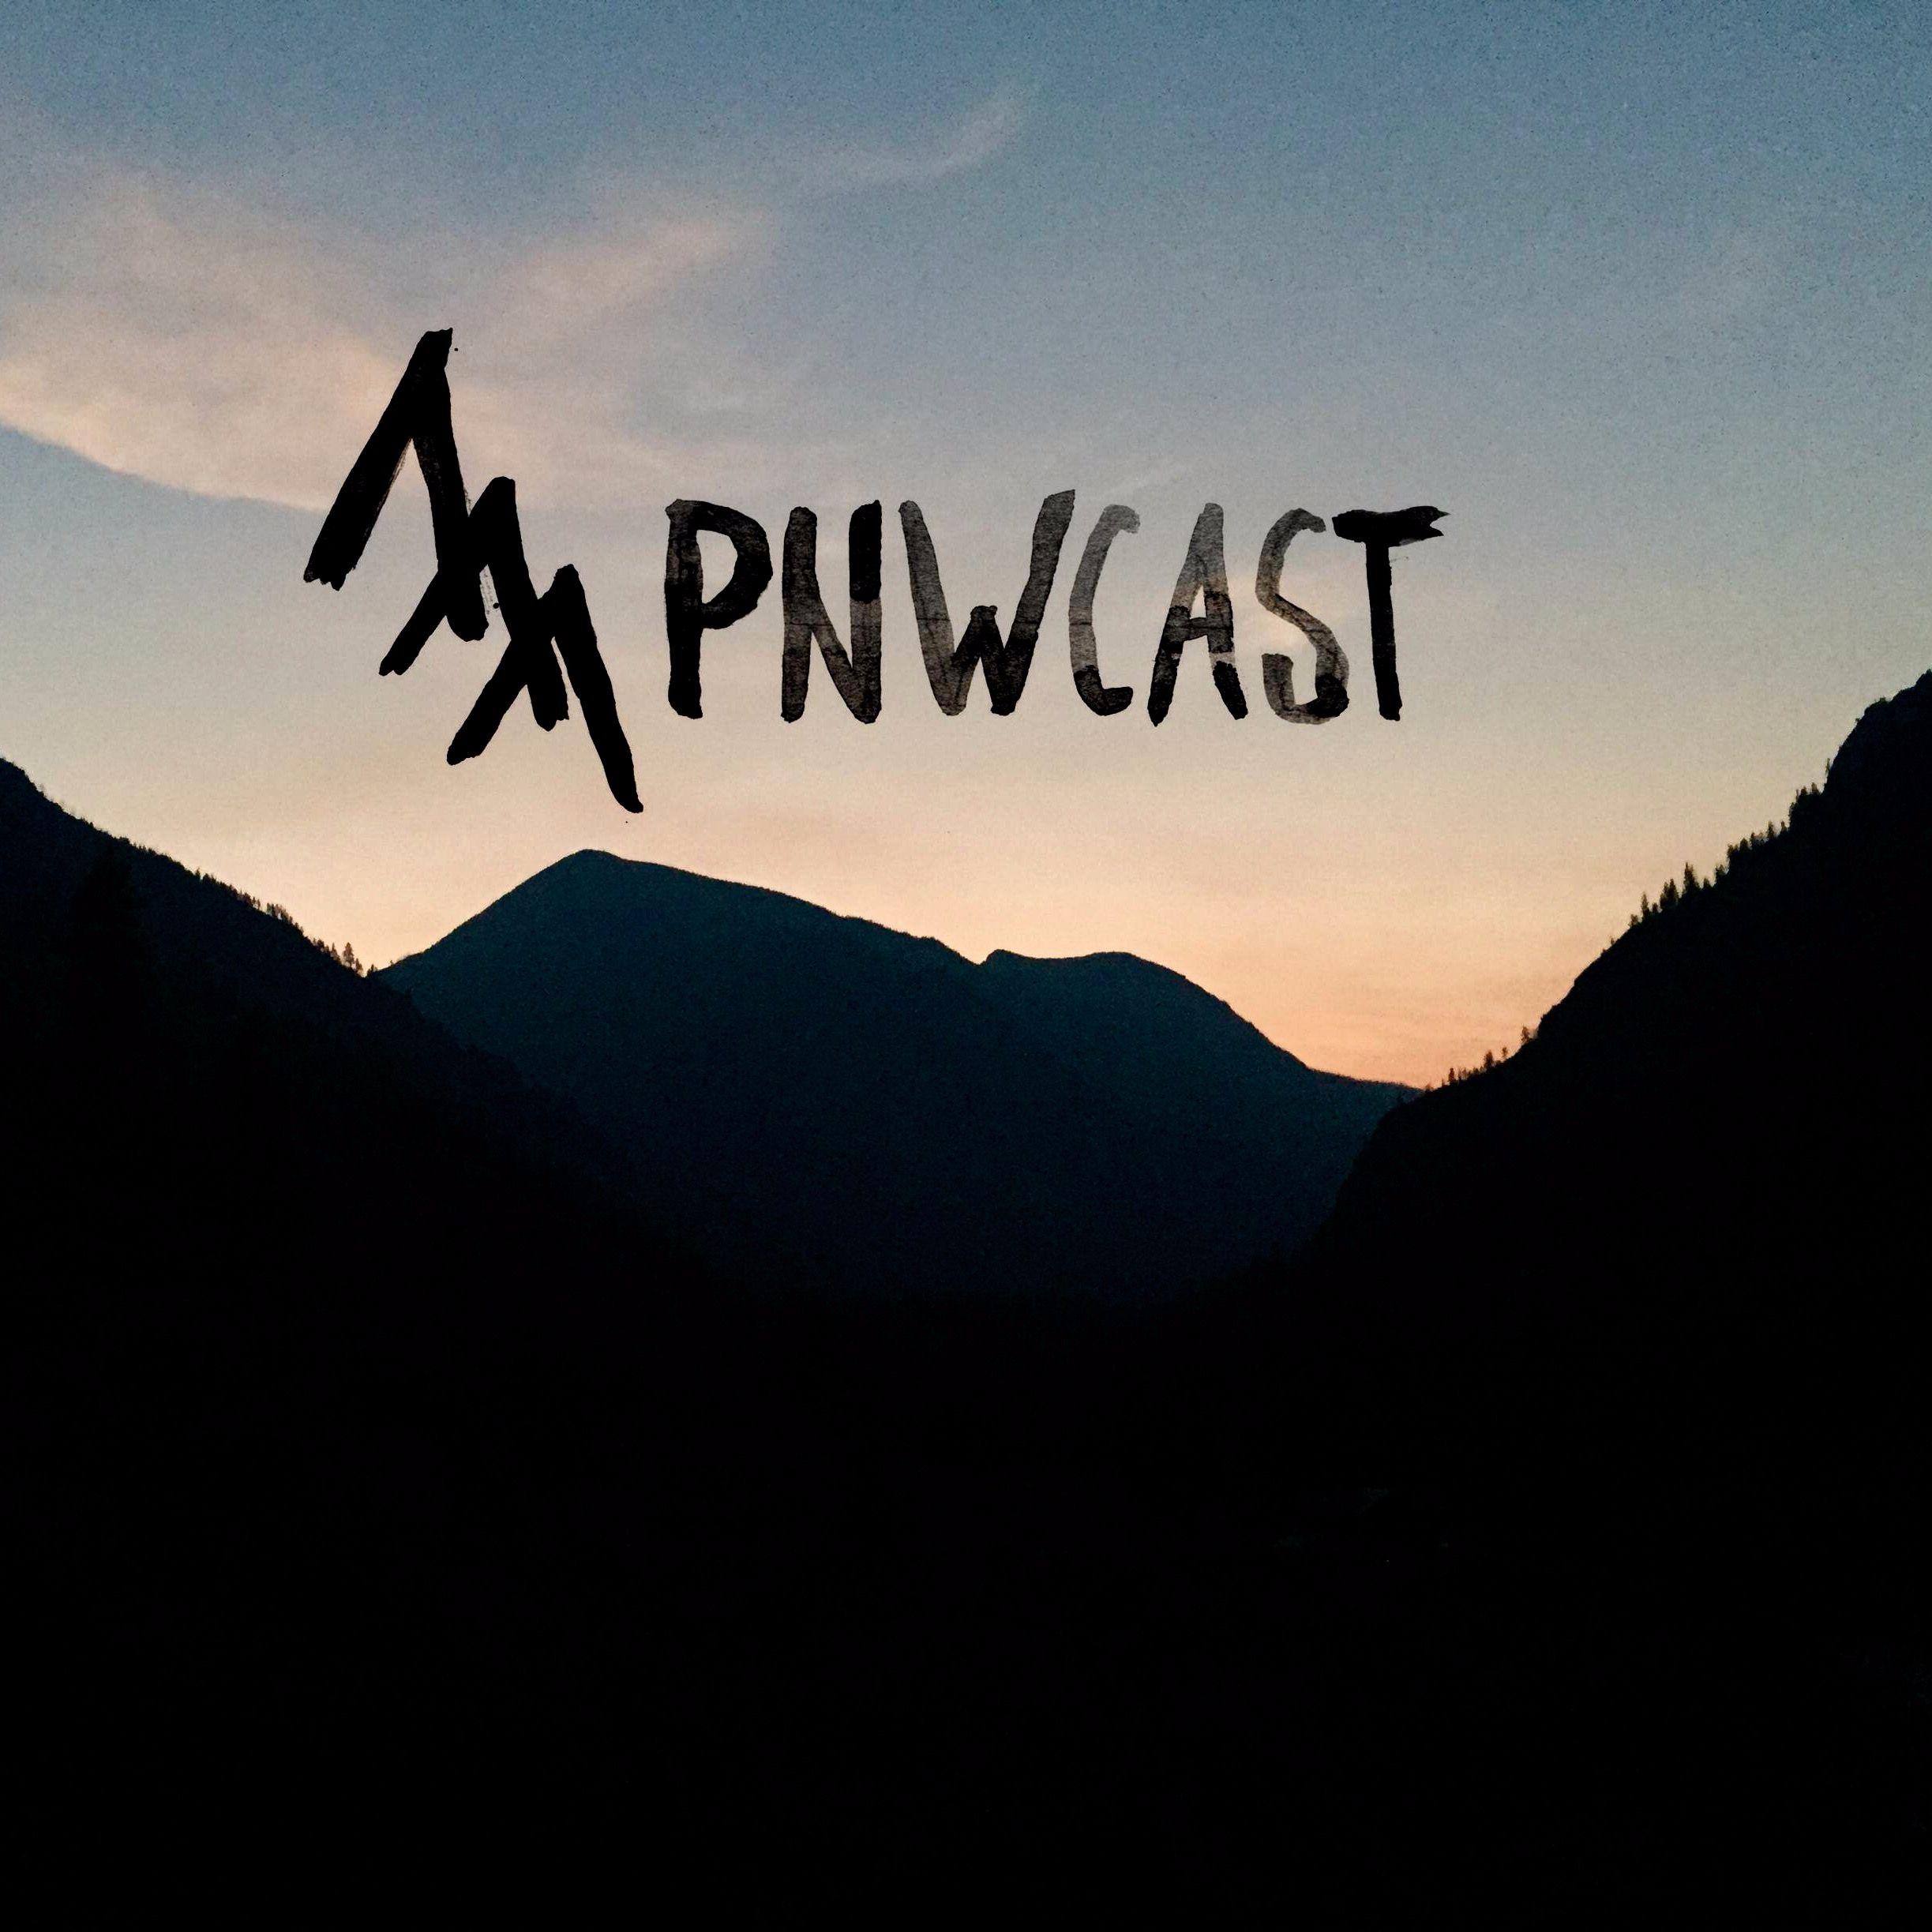 PNWcast